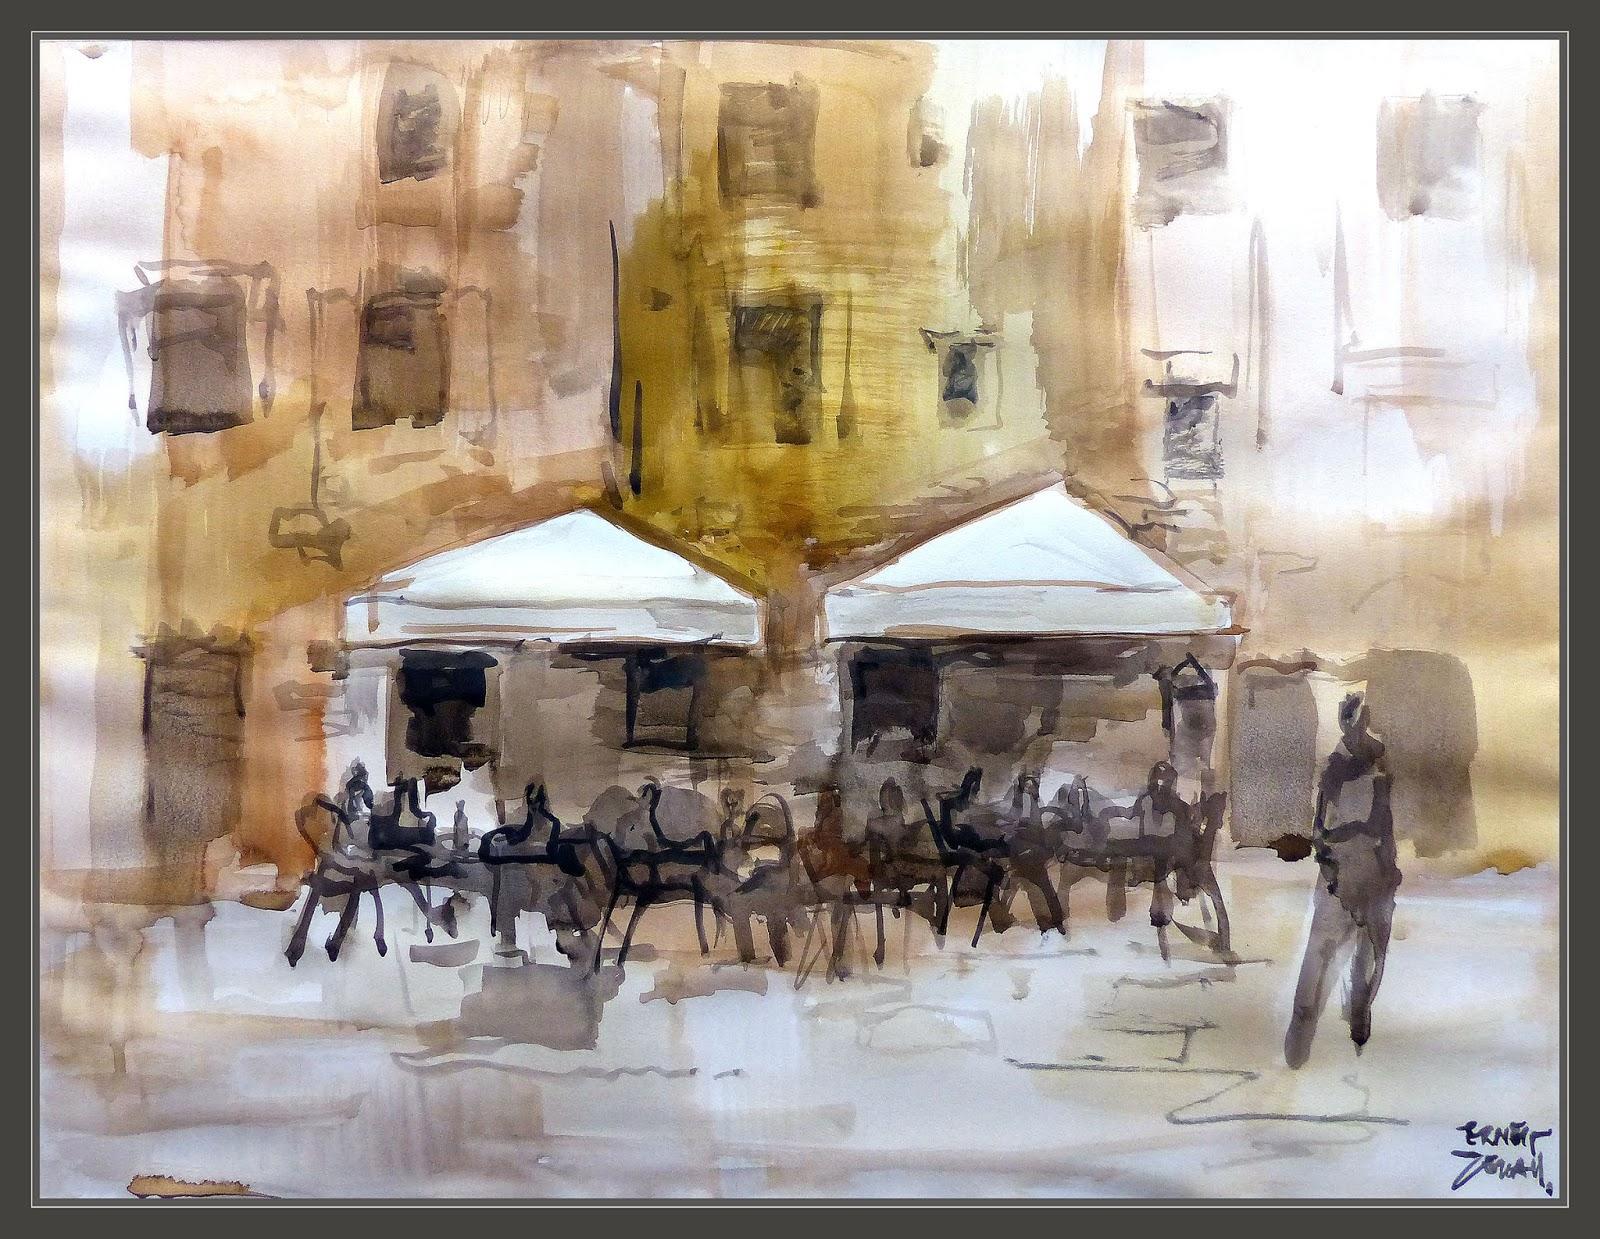 Ernest Descals Artista Pintor Venecia Pintura Acuarelas